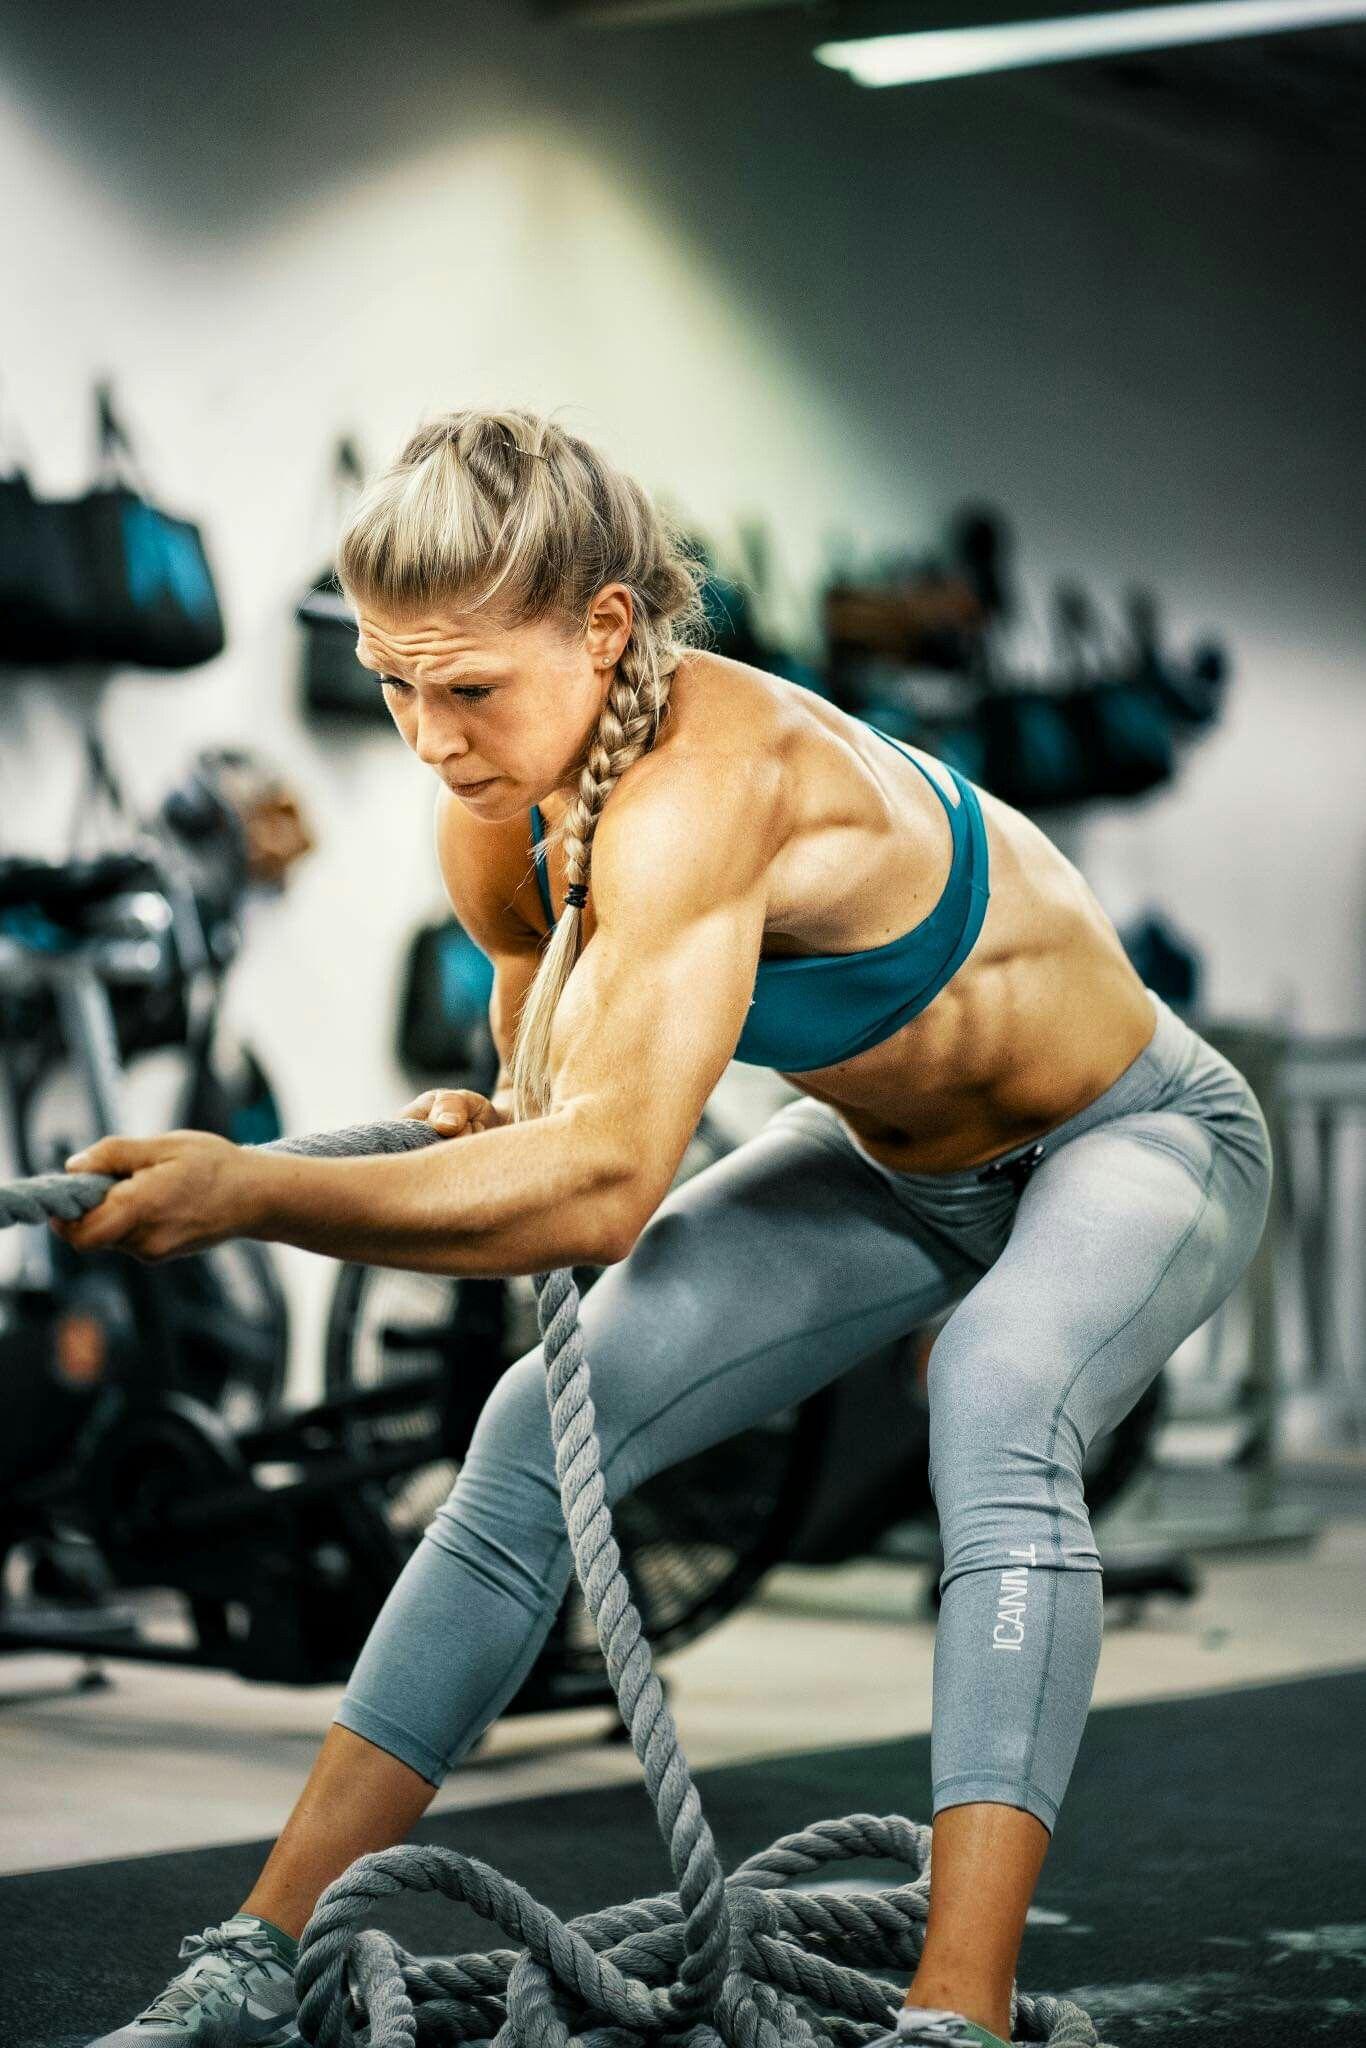 CrossFit Training | Muscle girls, Crossfit girl, Crossfit